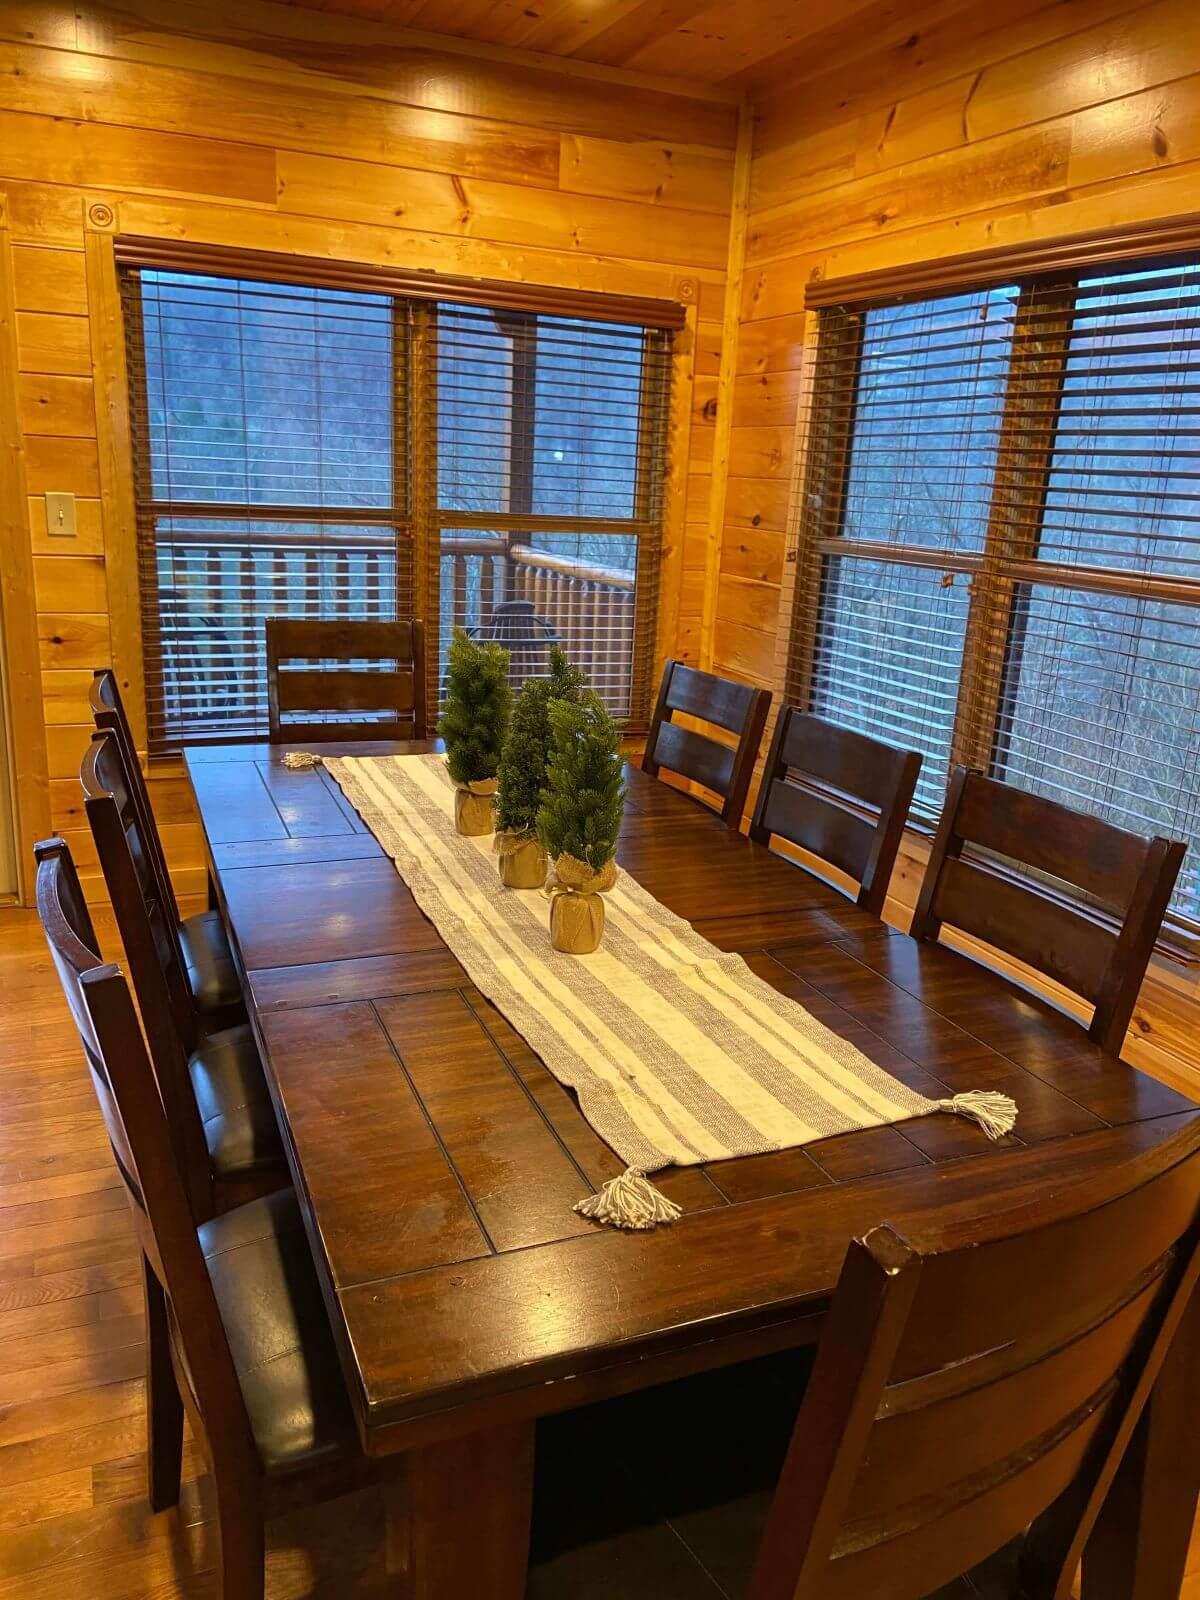 Cypress Lodge Dining Room seats 8